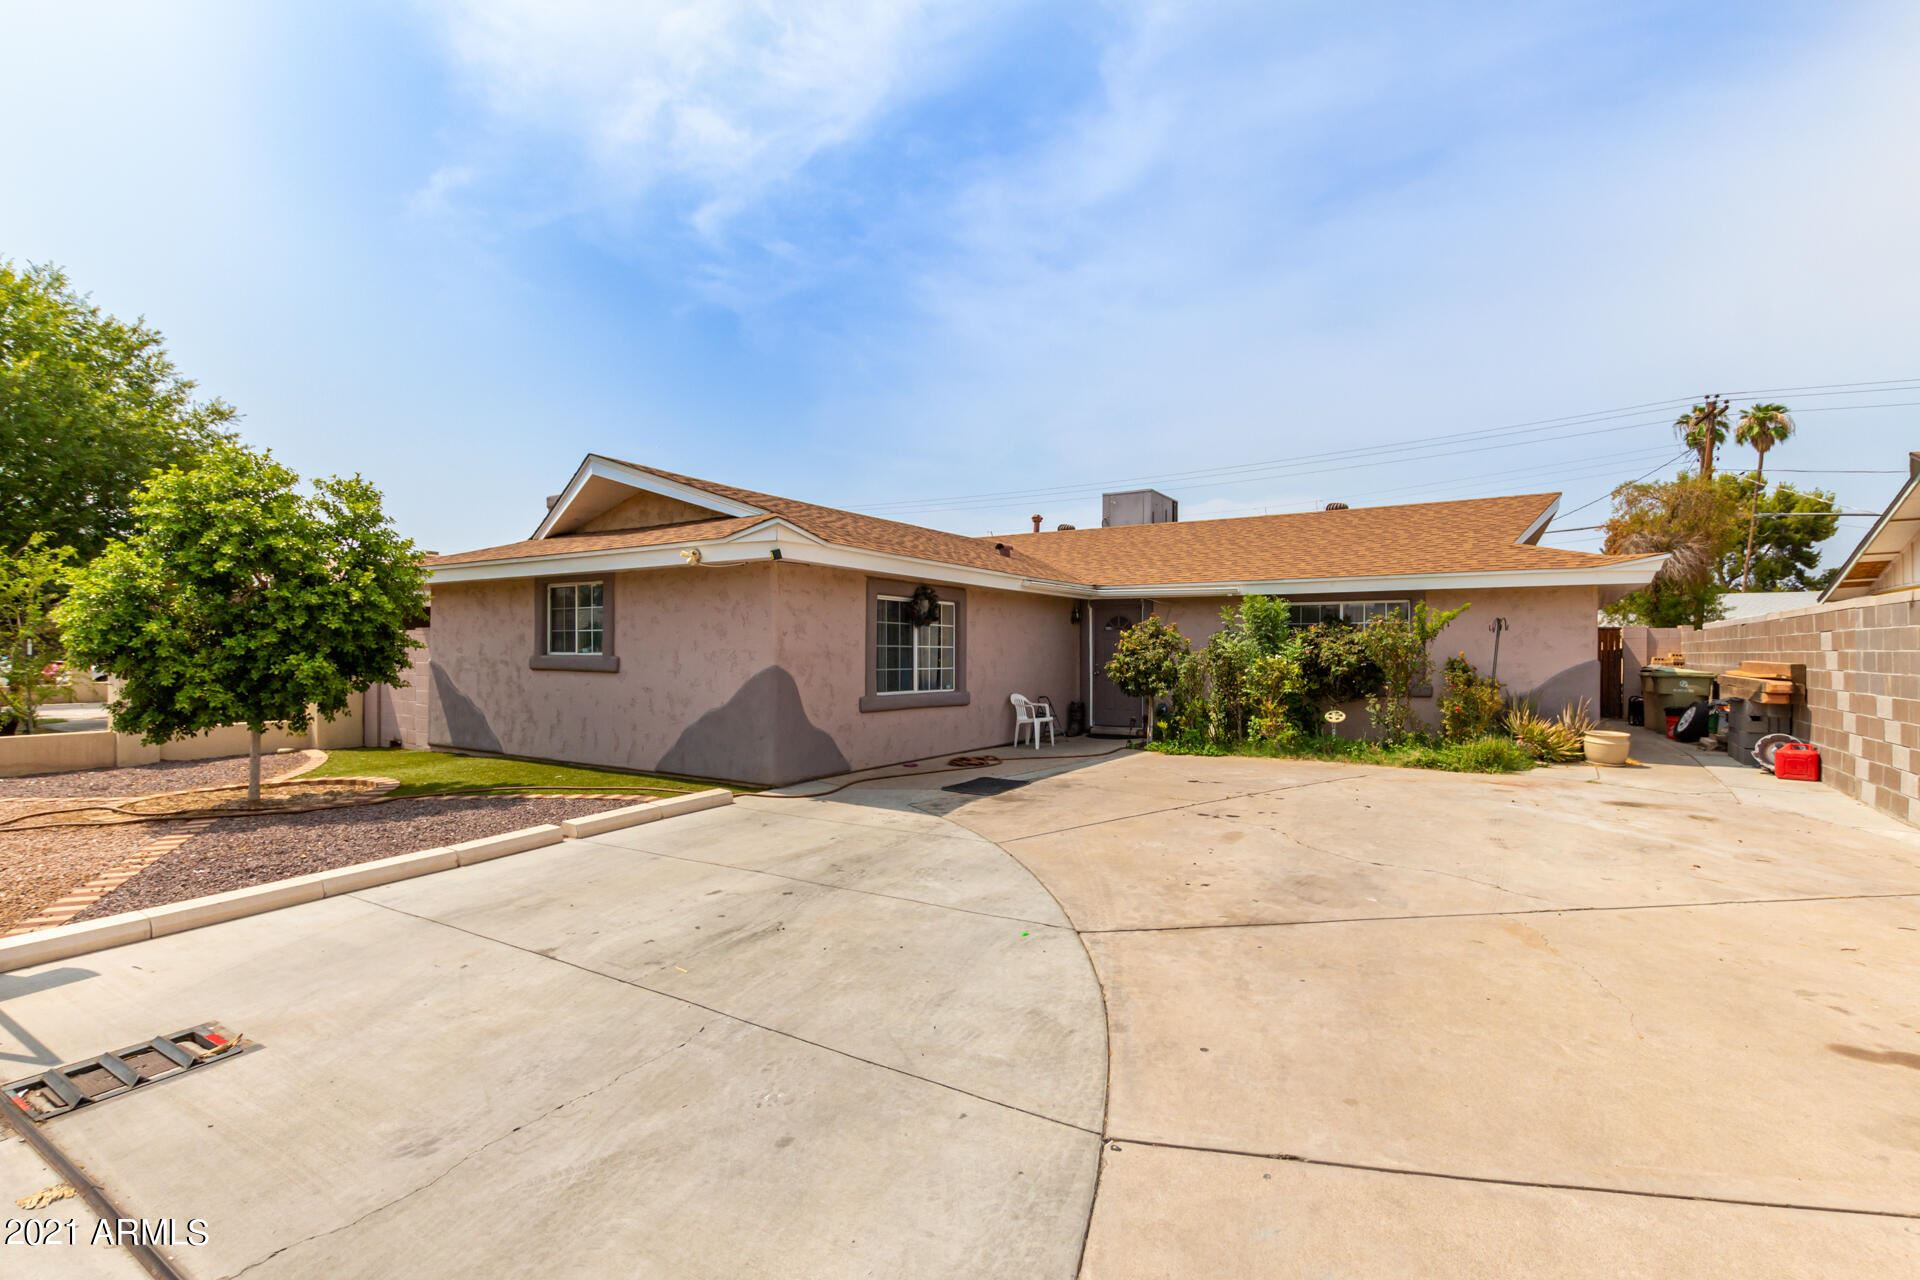 Photo of 4612 W KEIM Drive, Glendale, AZ 85301 (MLS # 6269038)